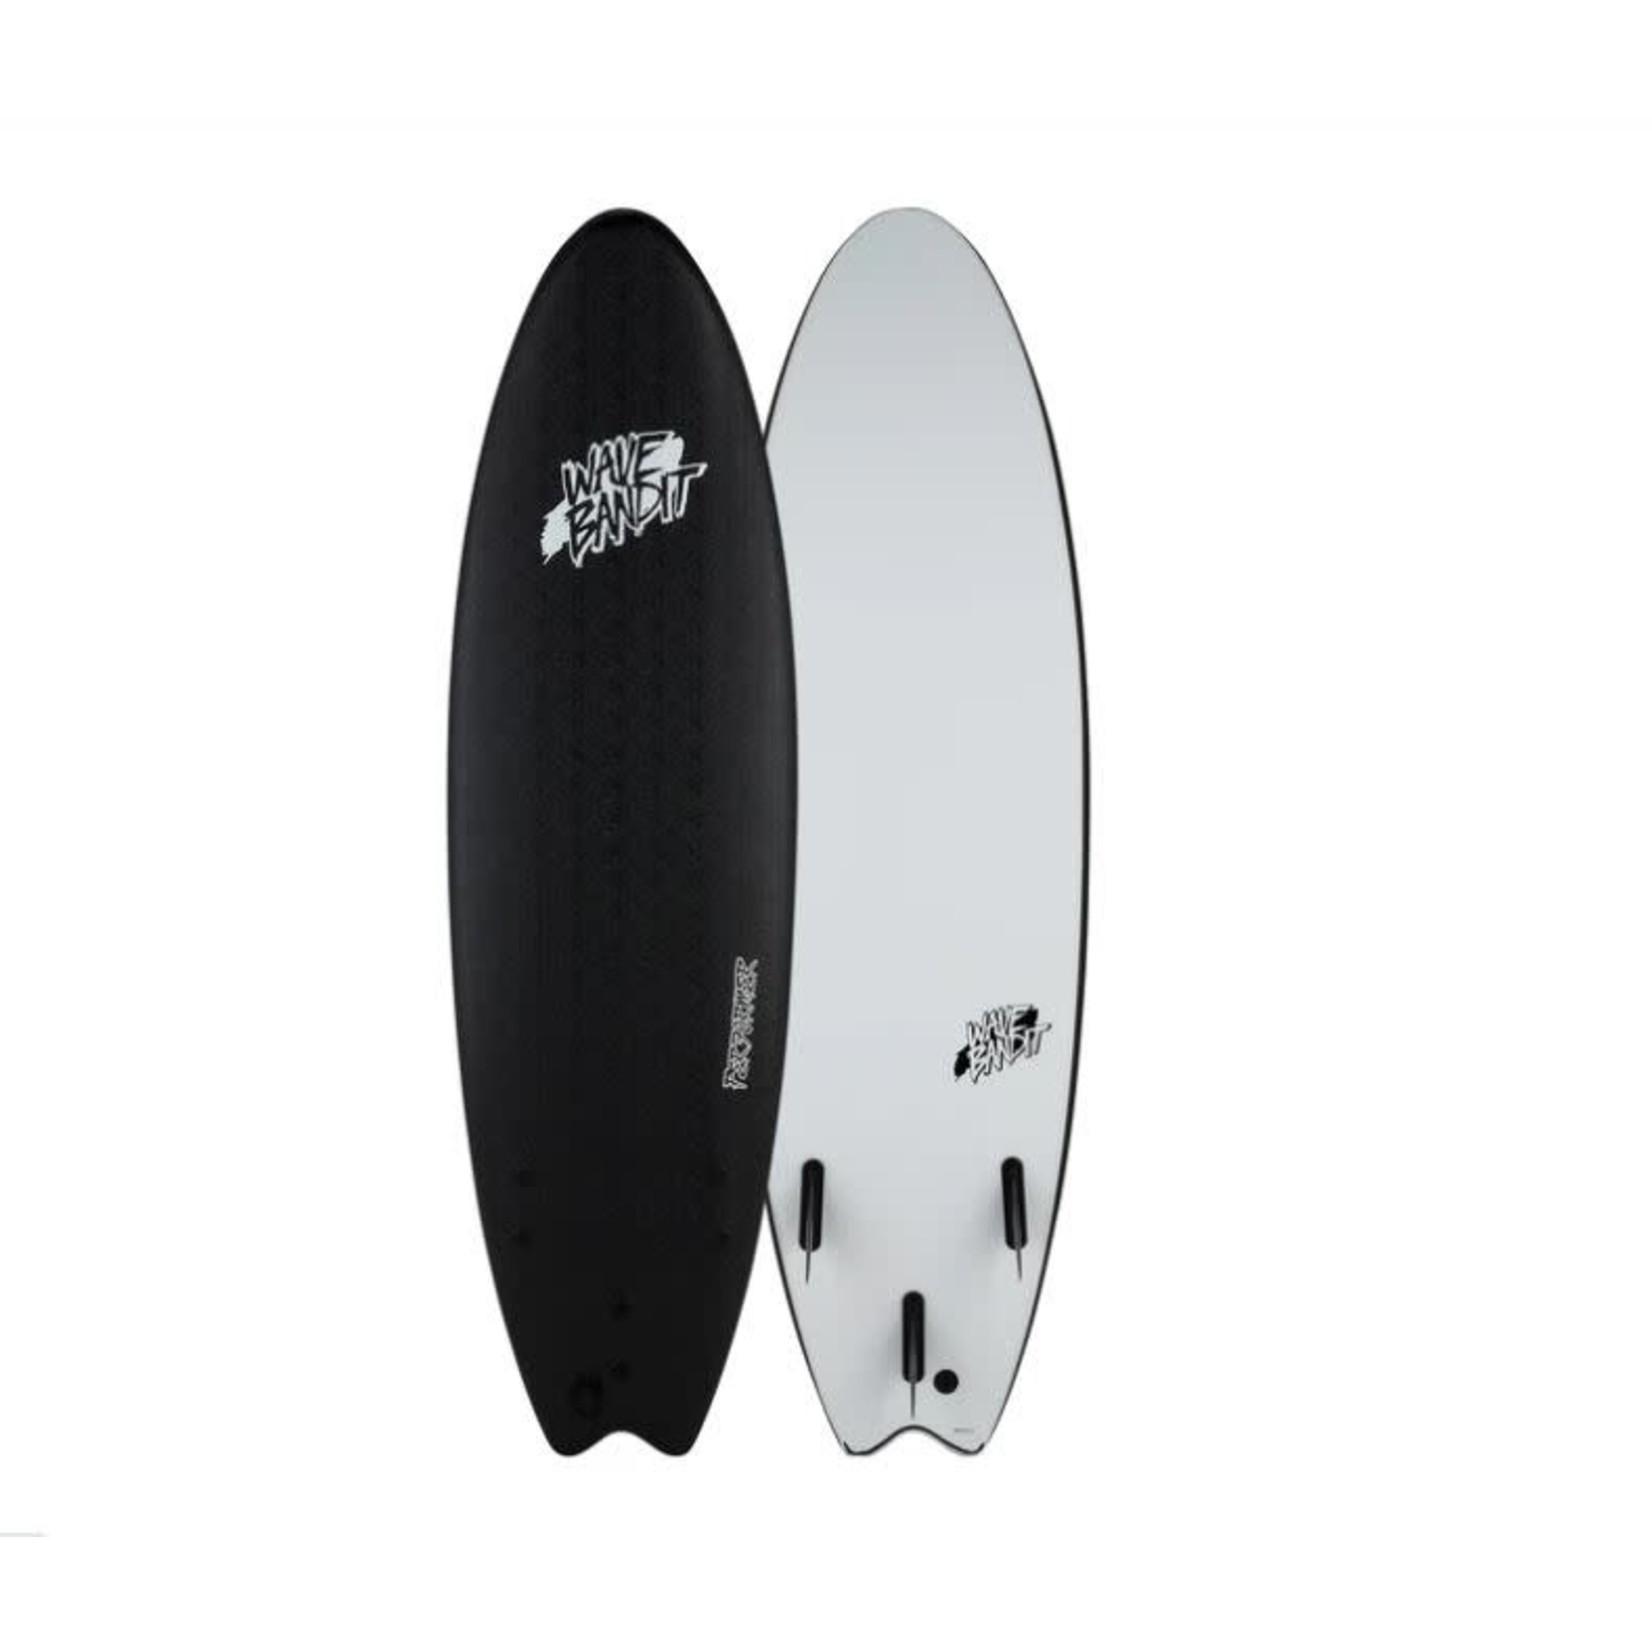 Catch Surf Wave Bandit PERFORMER 6.6 TRI